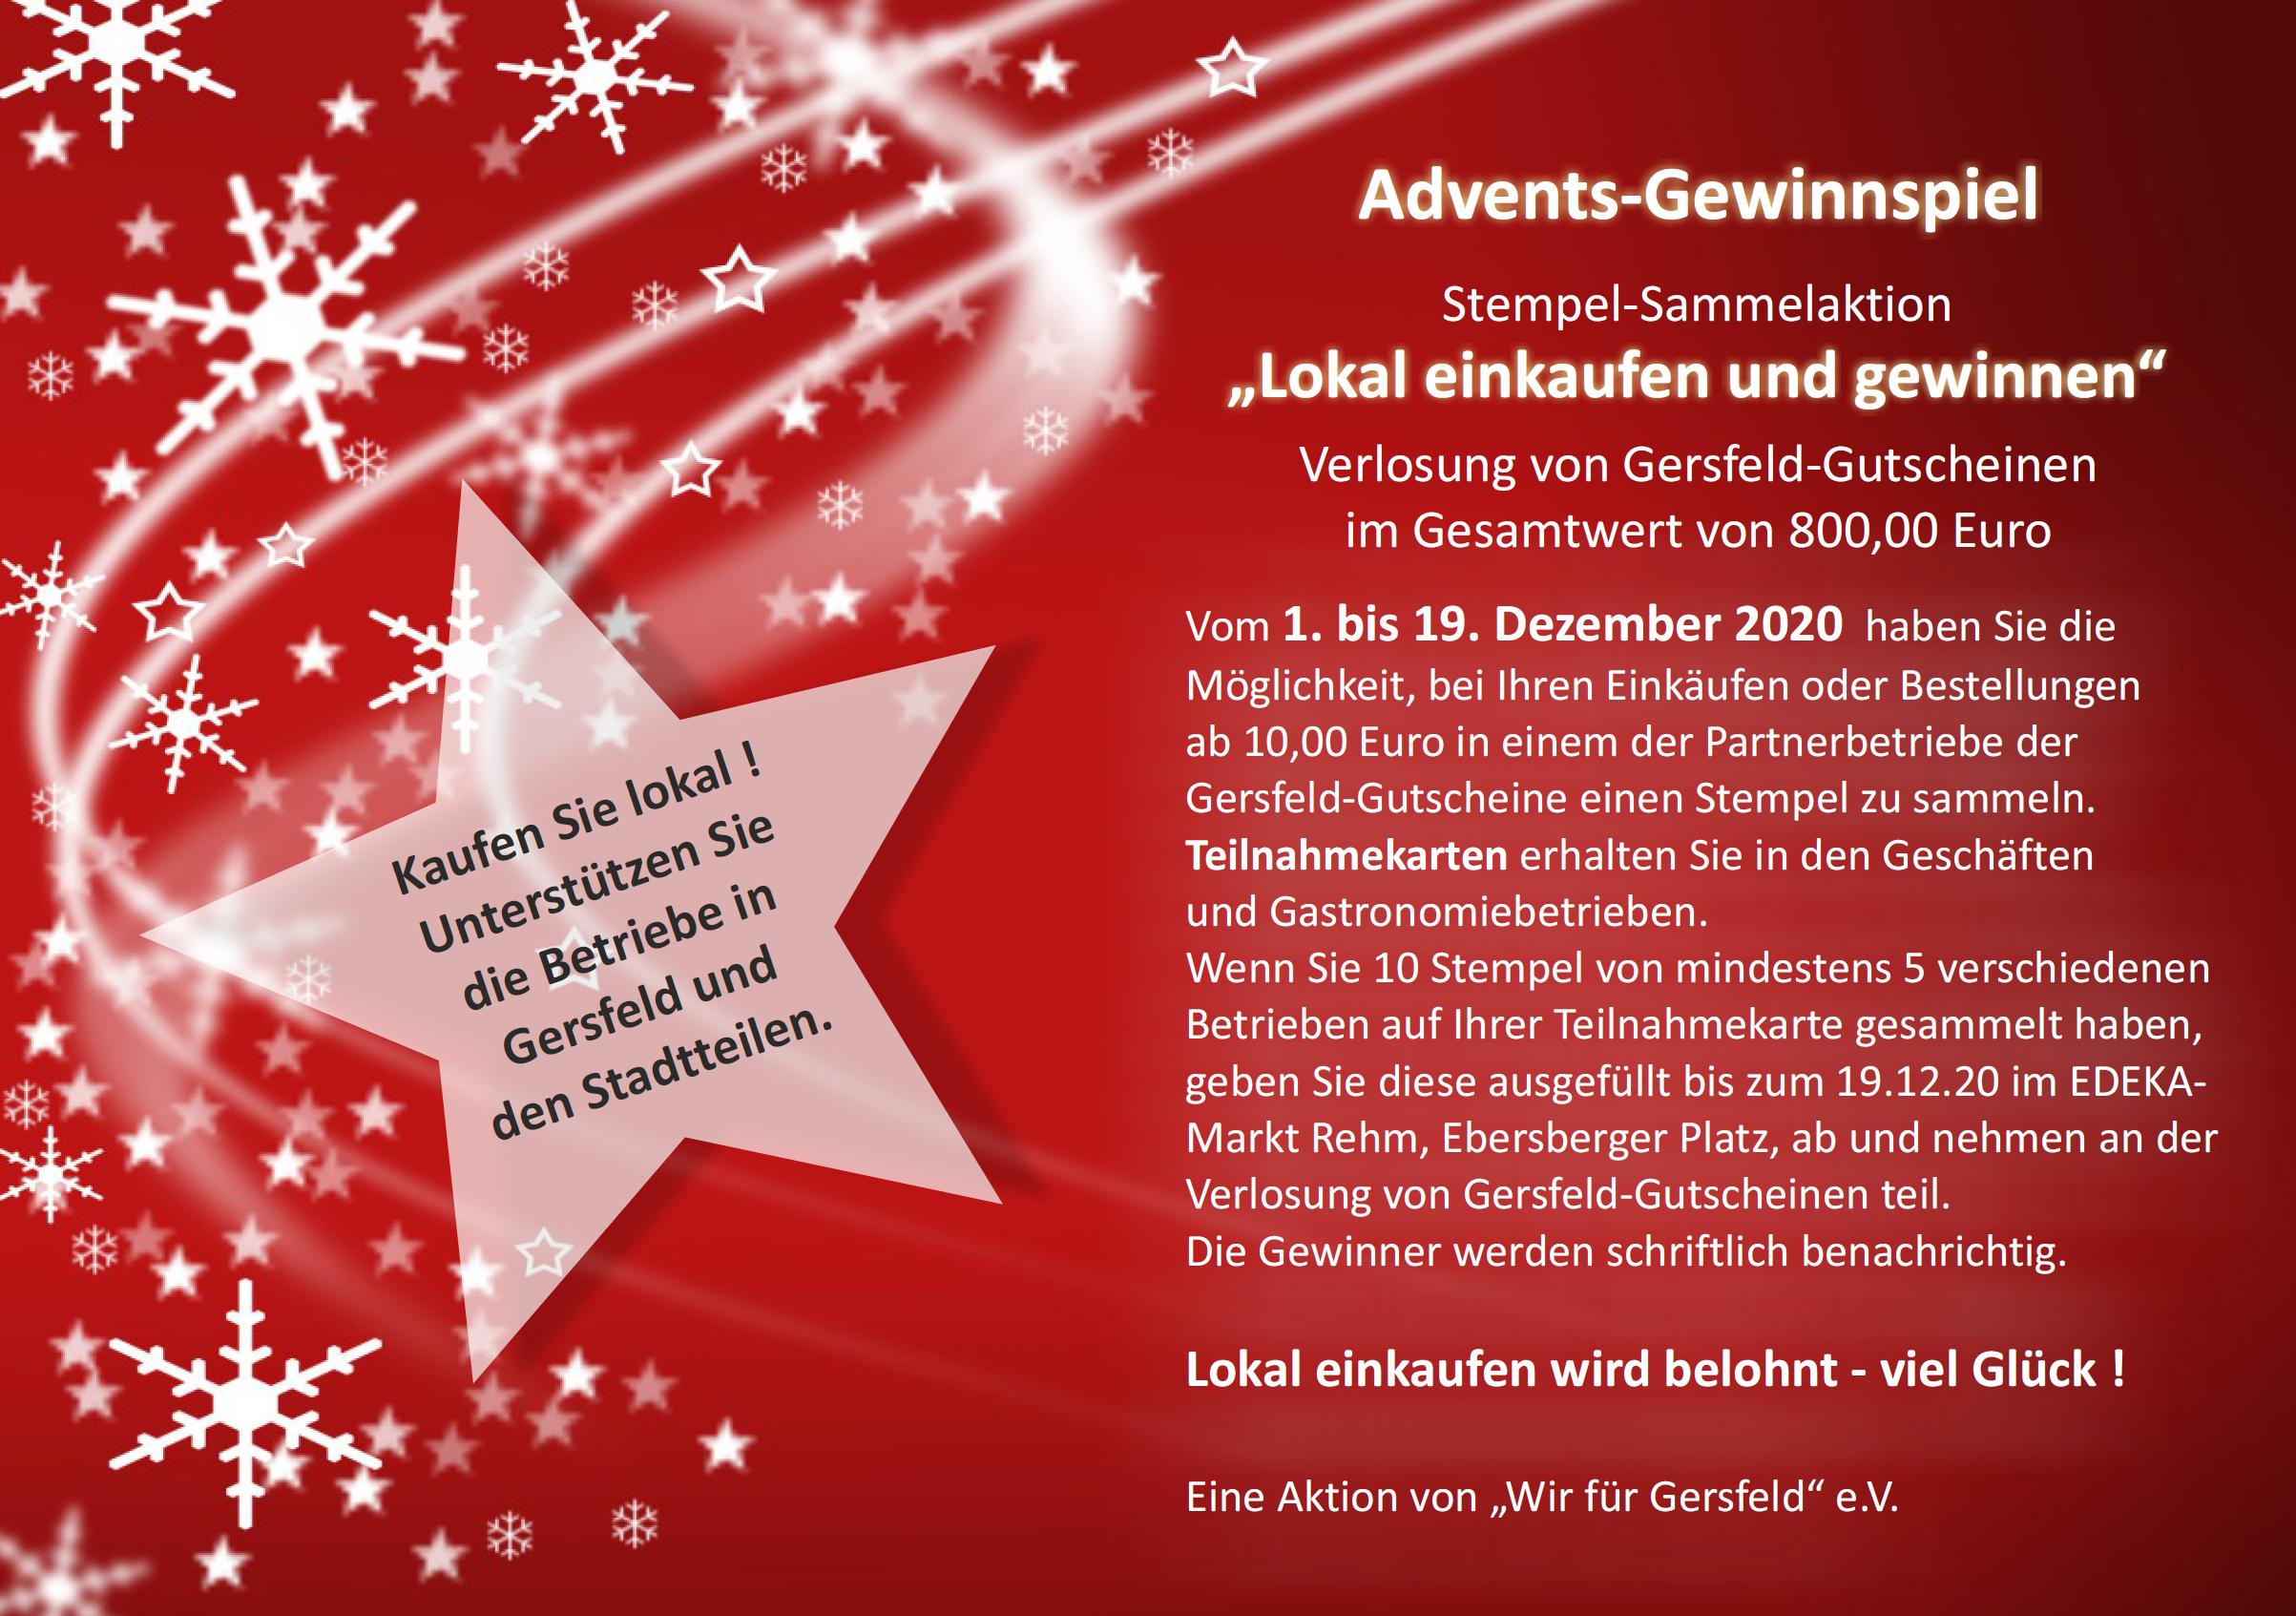 Gersfelder Adventskalender & Gewinnspiel